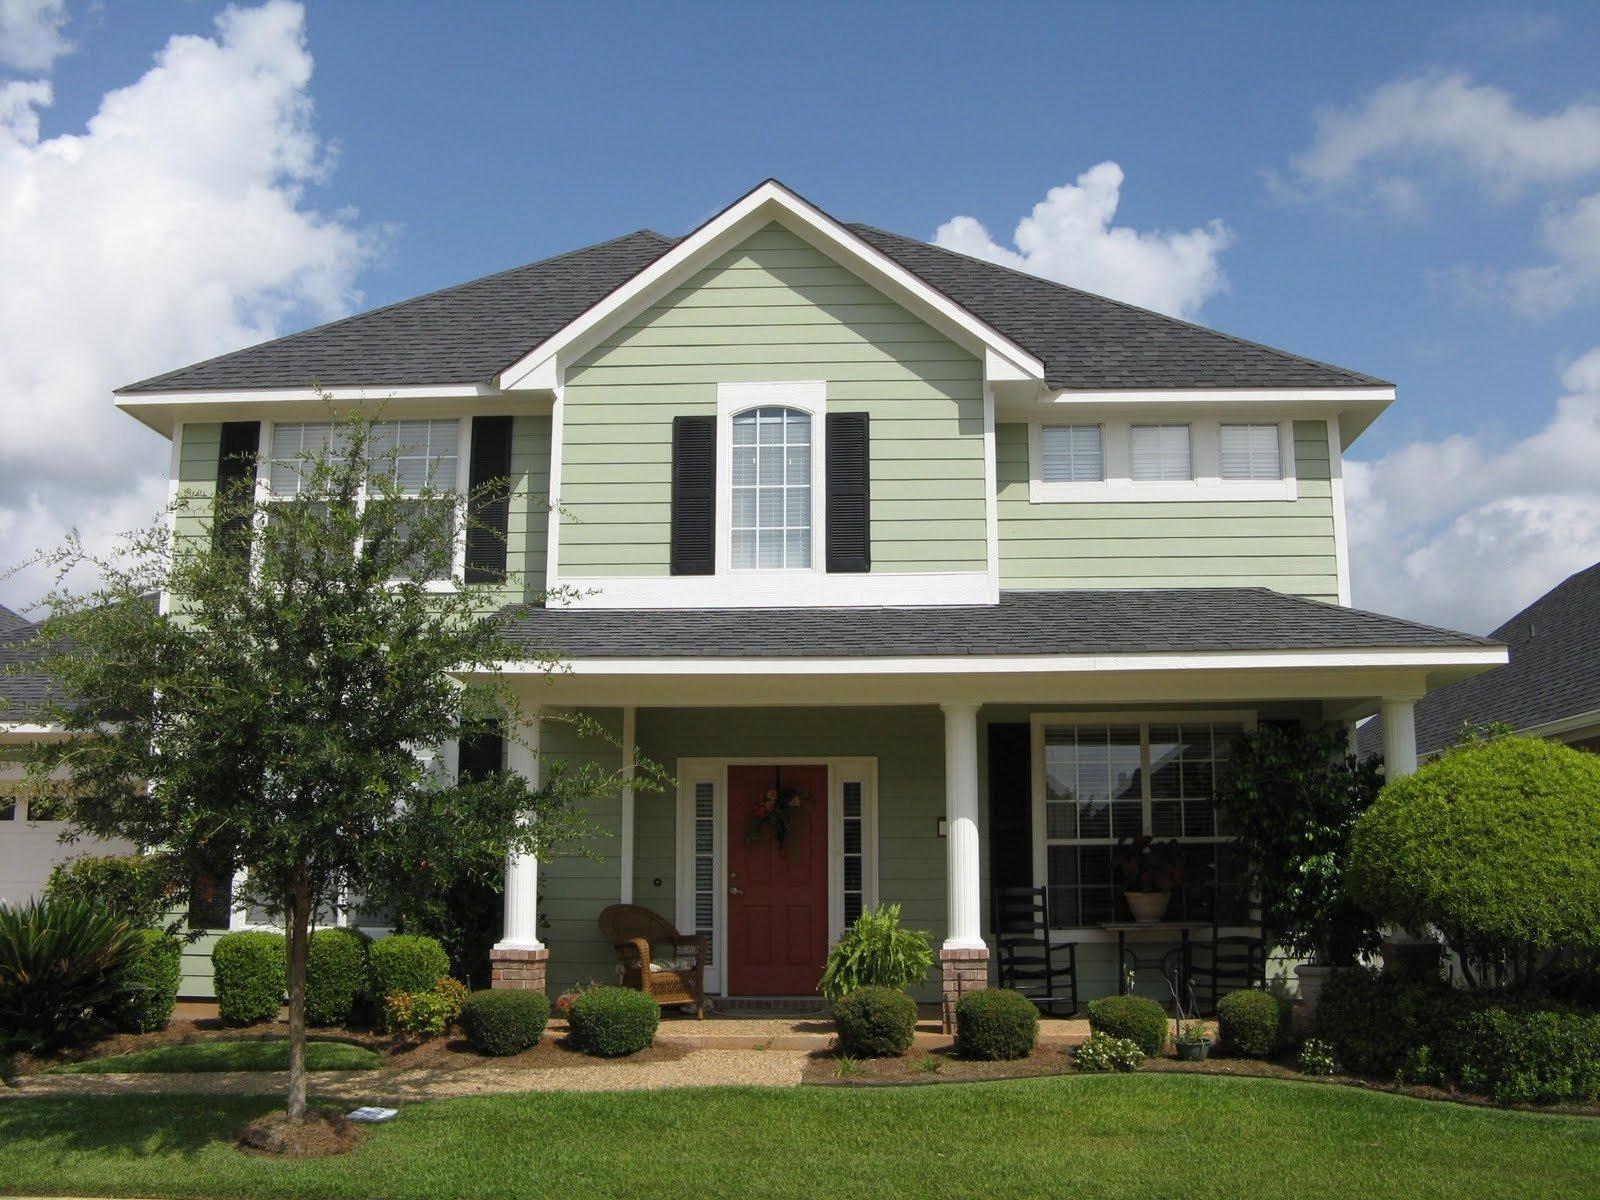 10 Ideal Exterior House Paint Color Ideas 10 best house colors images on pinterest exterior homes exterior 2020